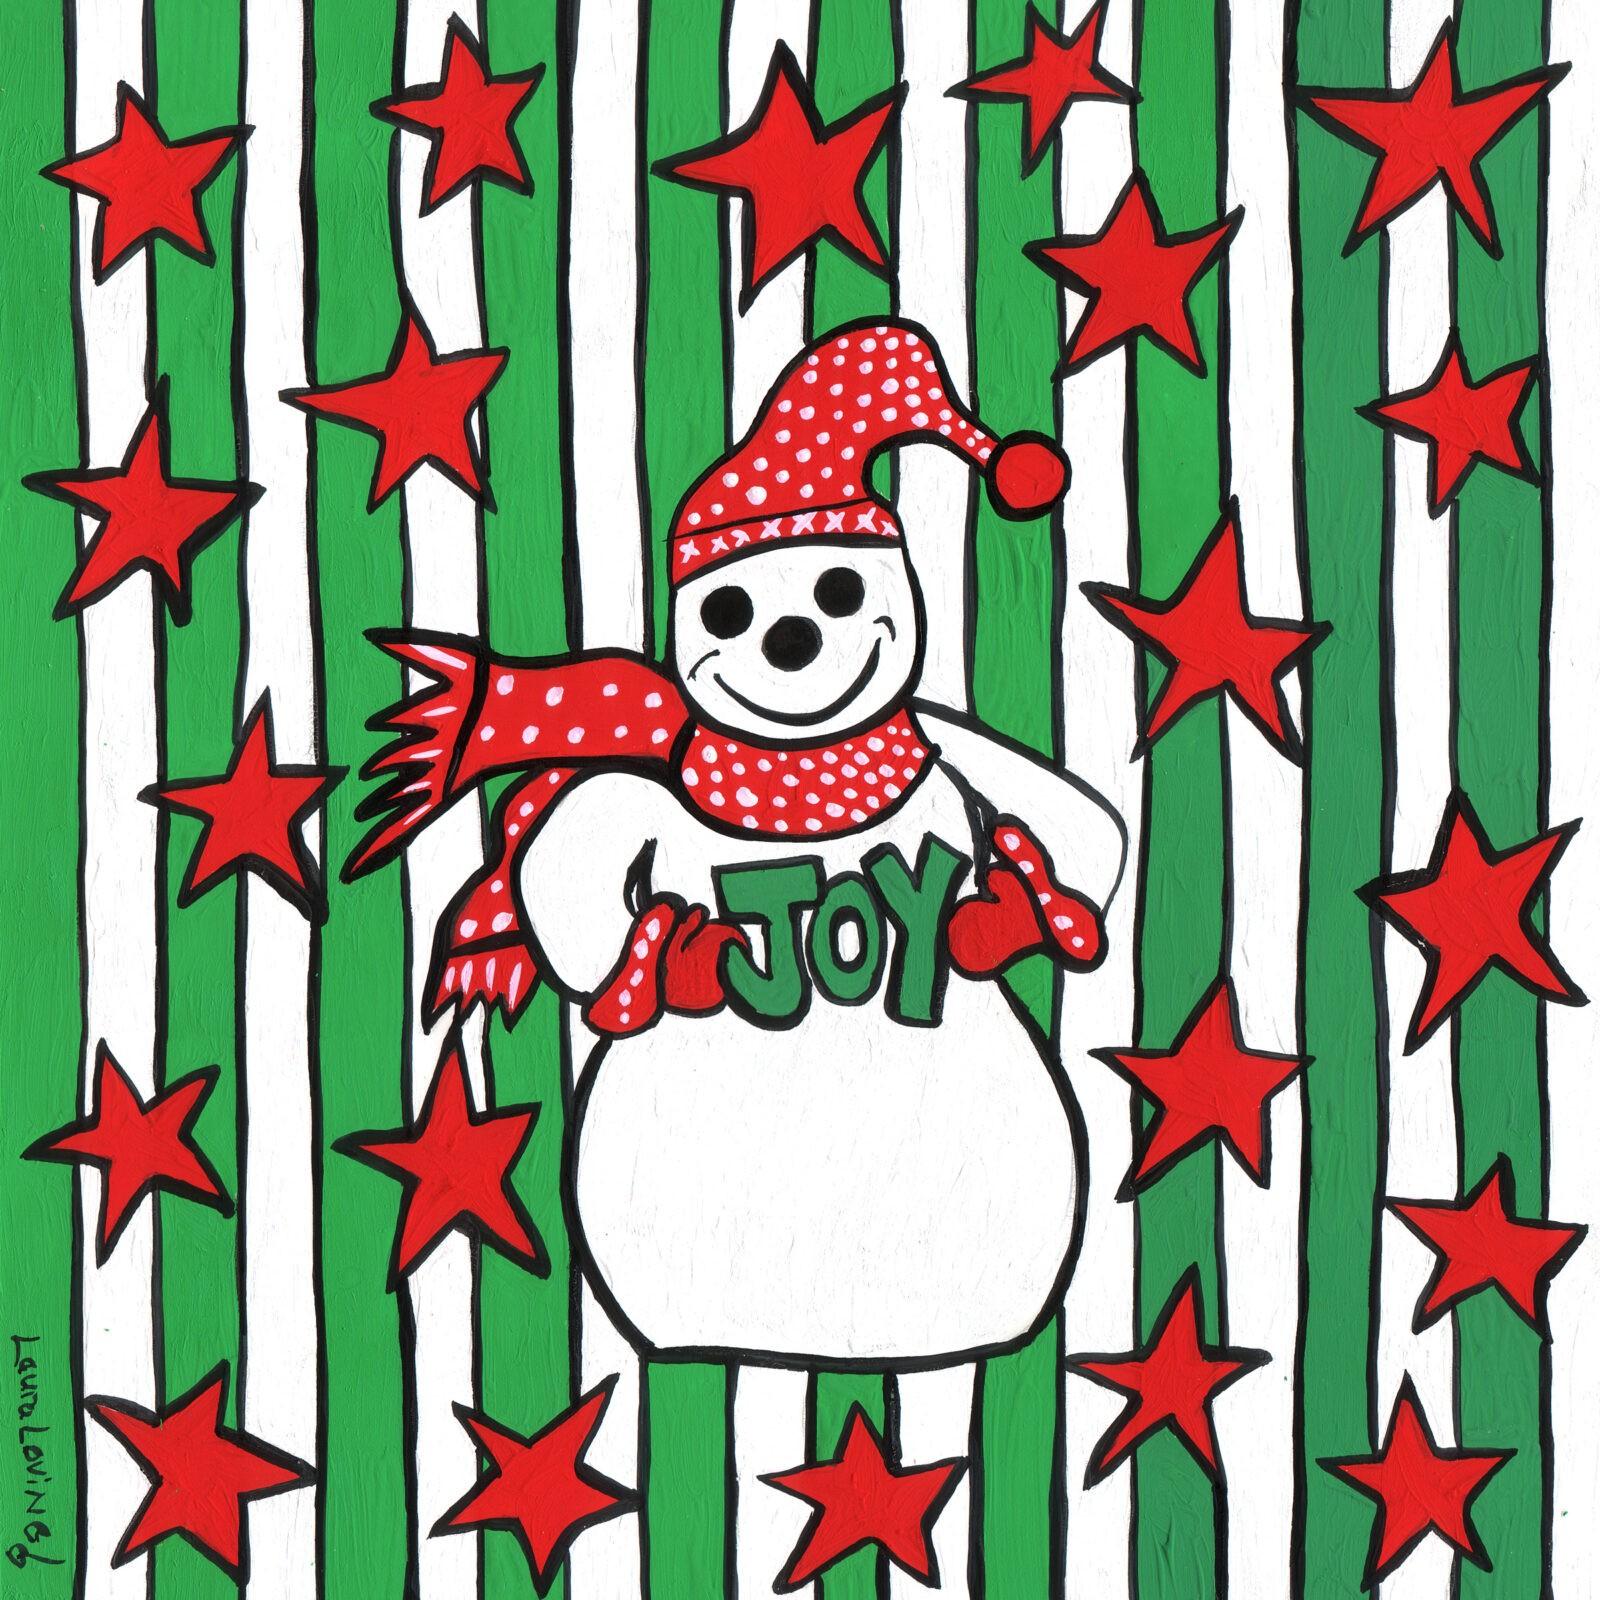 The Joyful Snowman Print